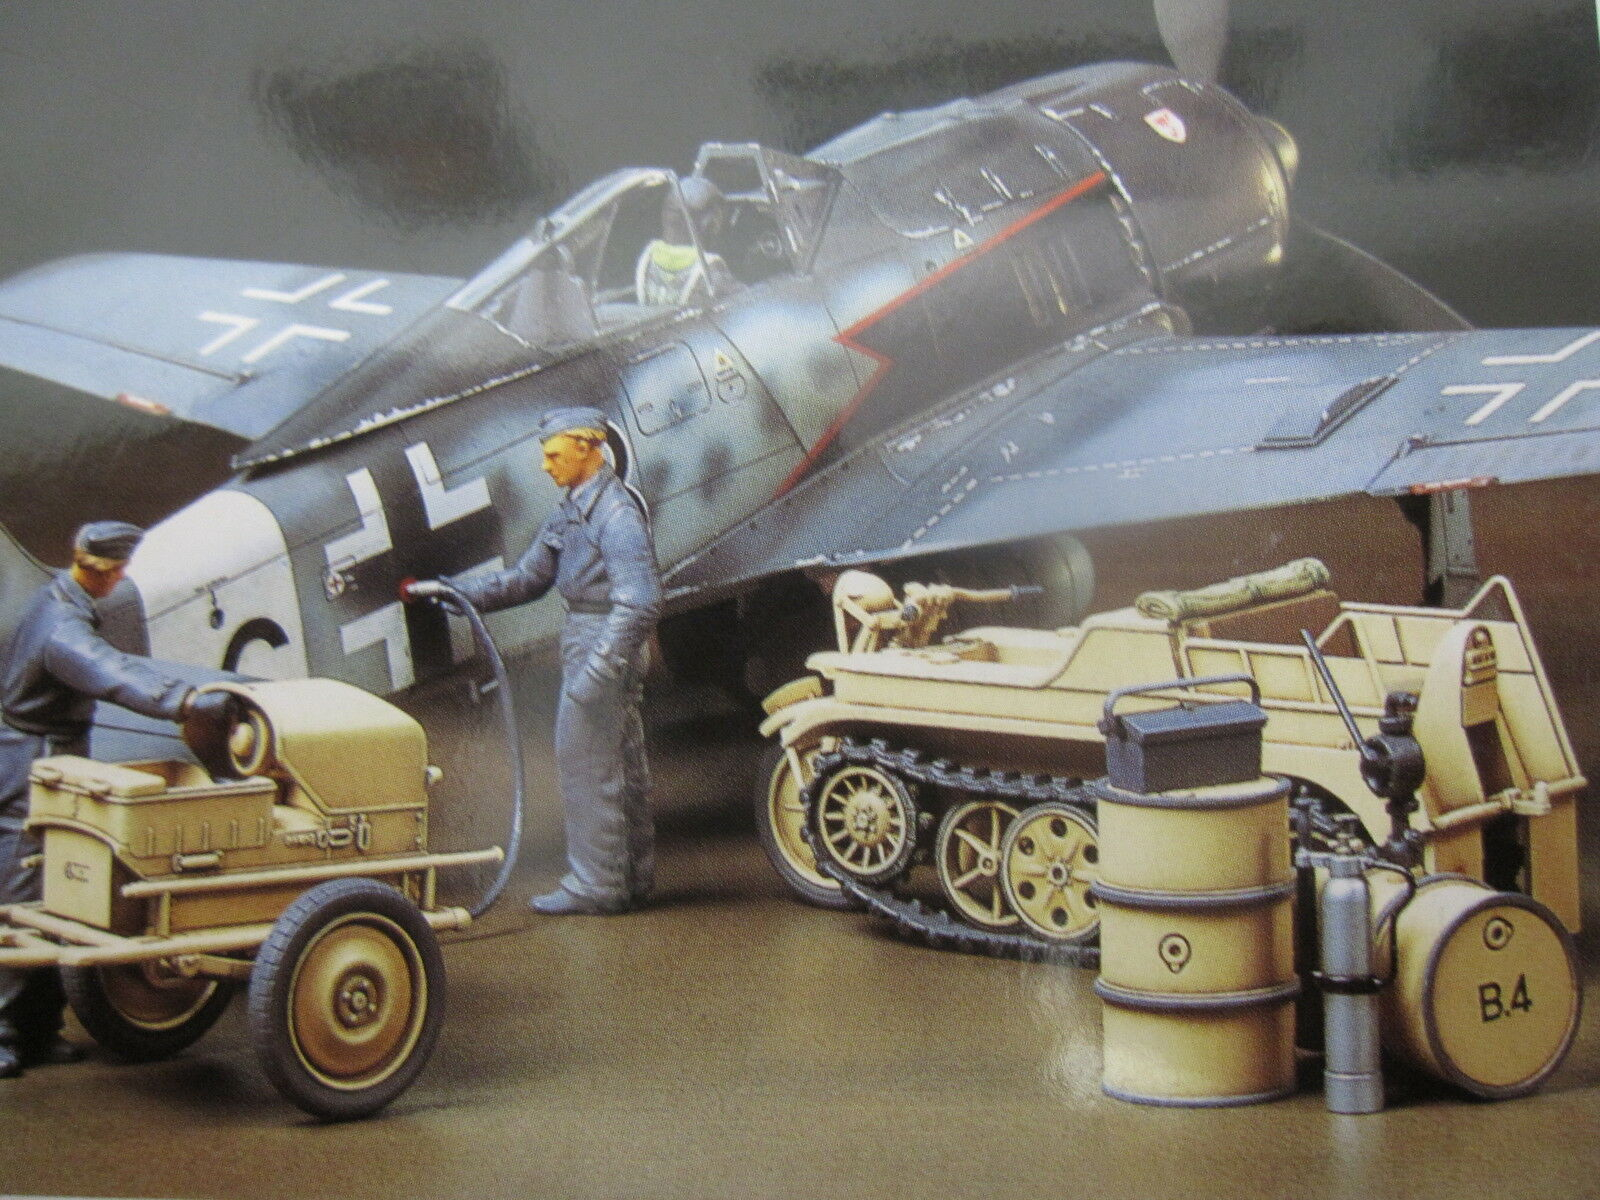 Focke-Wulf Fw 190 A8 A8 R2 mit Kettengrad und Sternthilfegerät TAMIYA 1 48 NEU